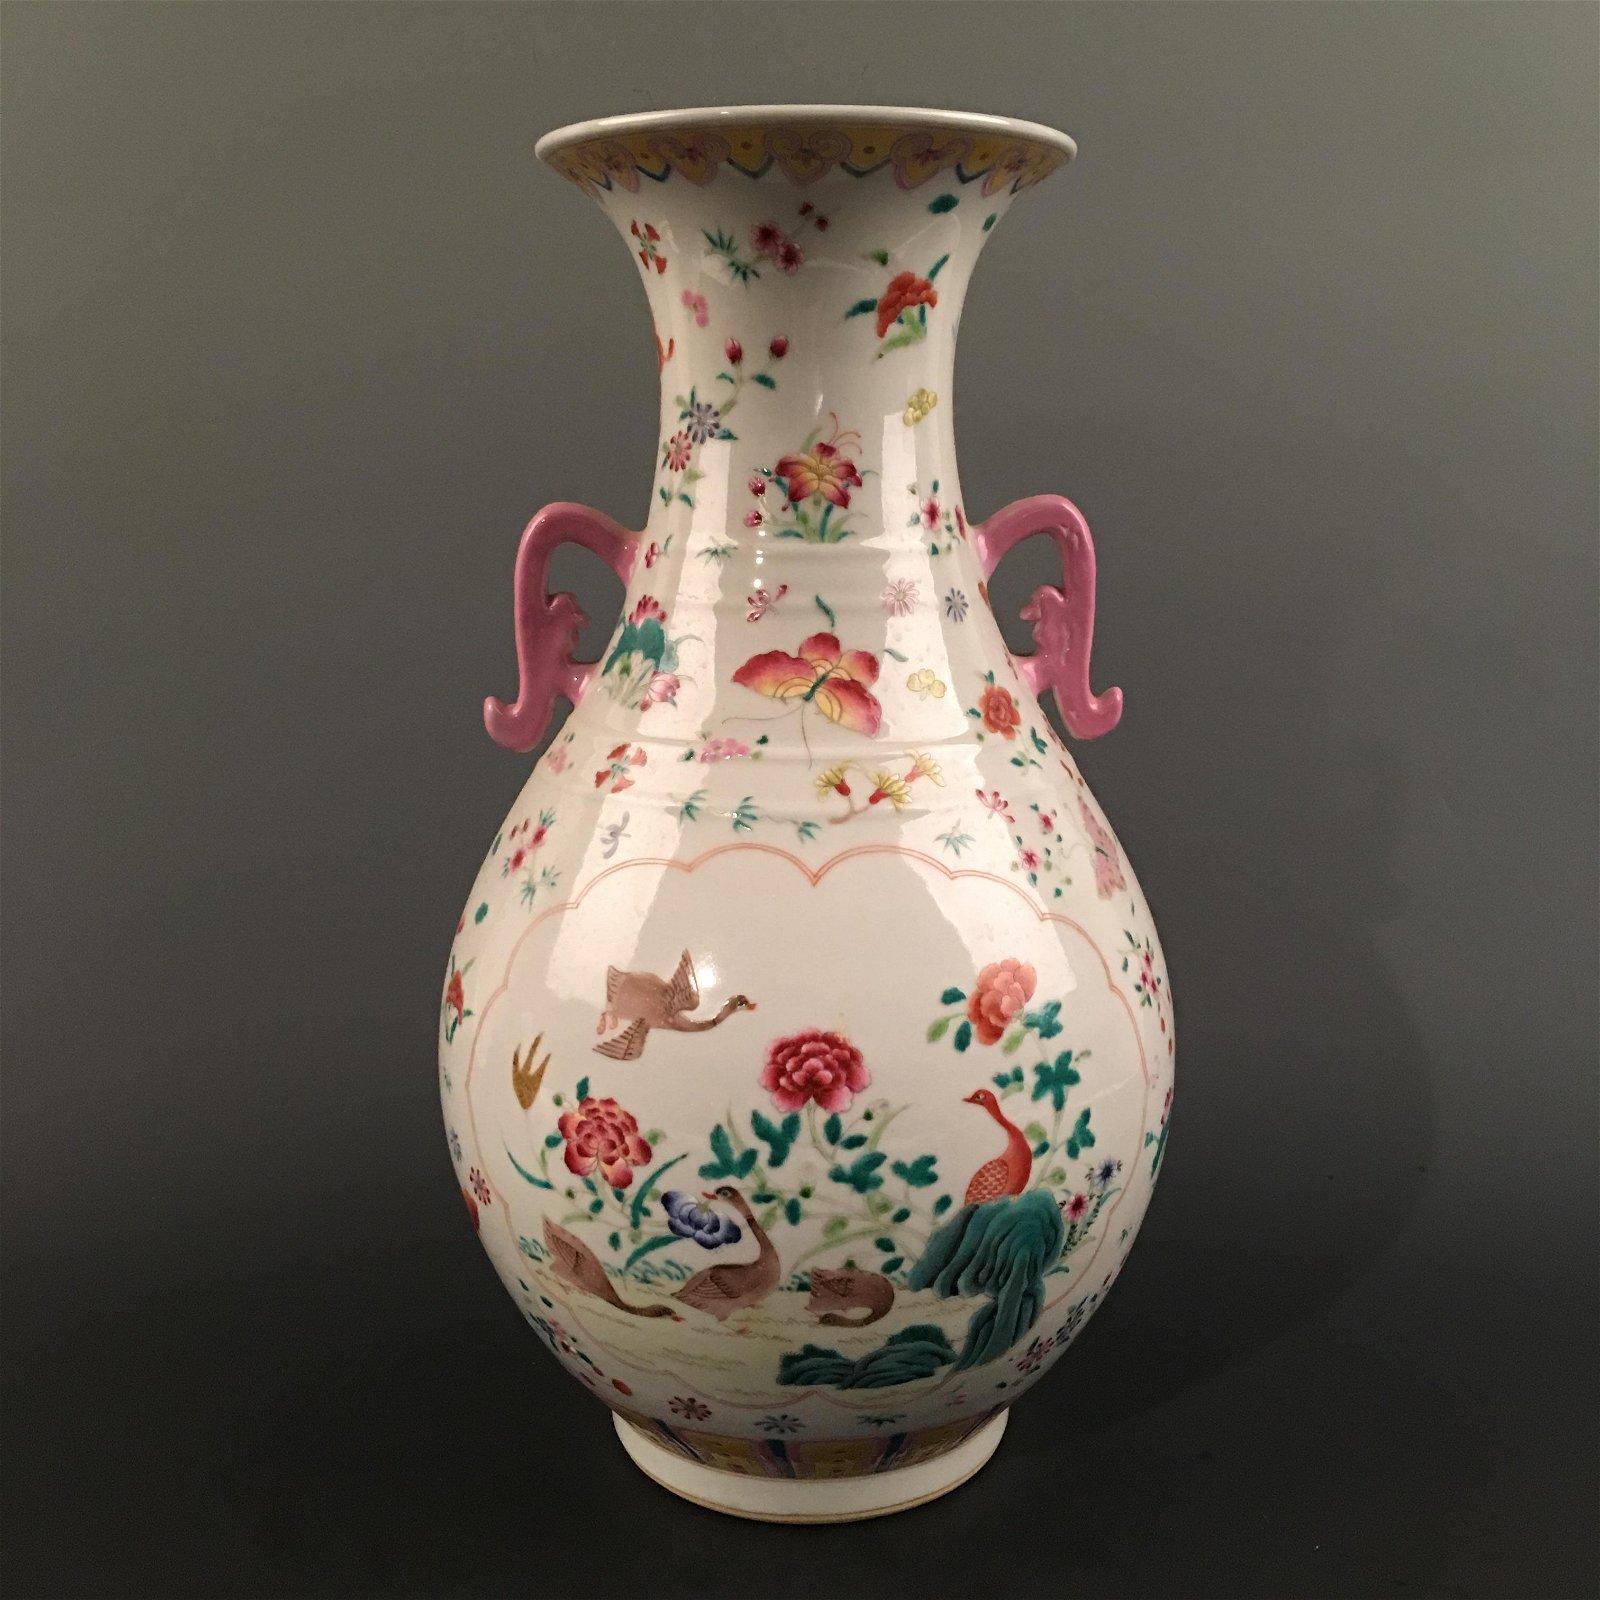 Chinese Famille Rose 'Bird & Floral' Vase, Qianlong